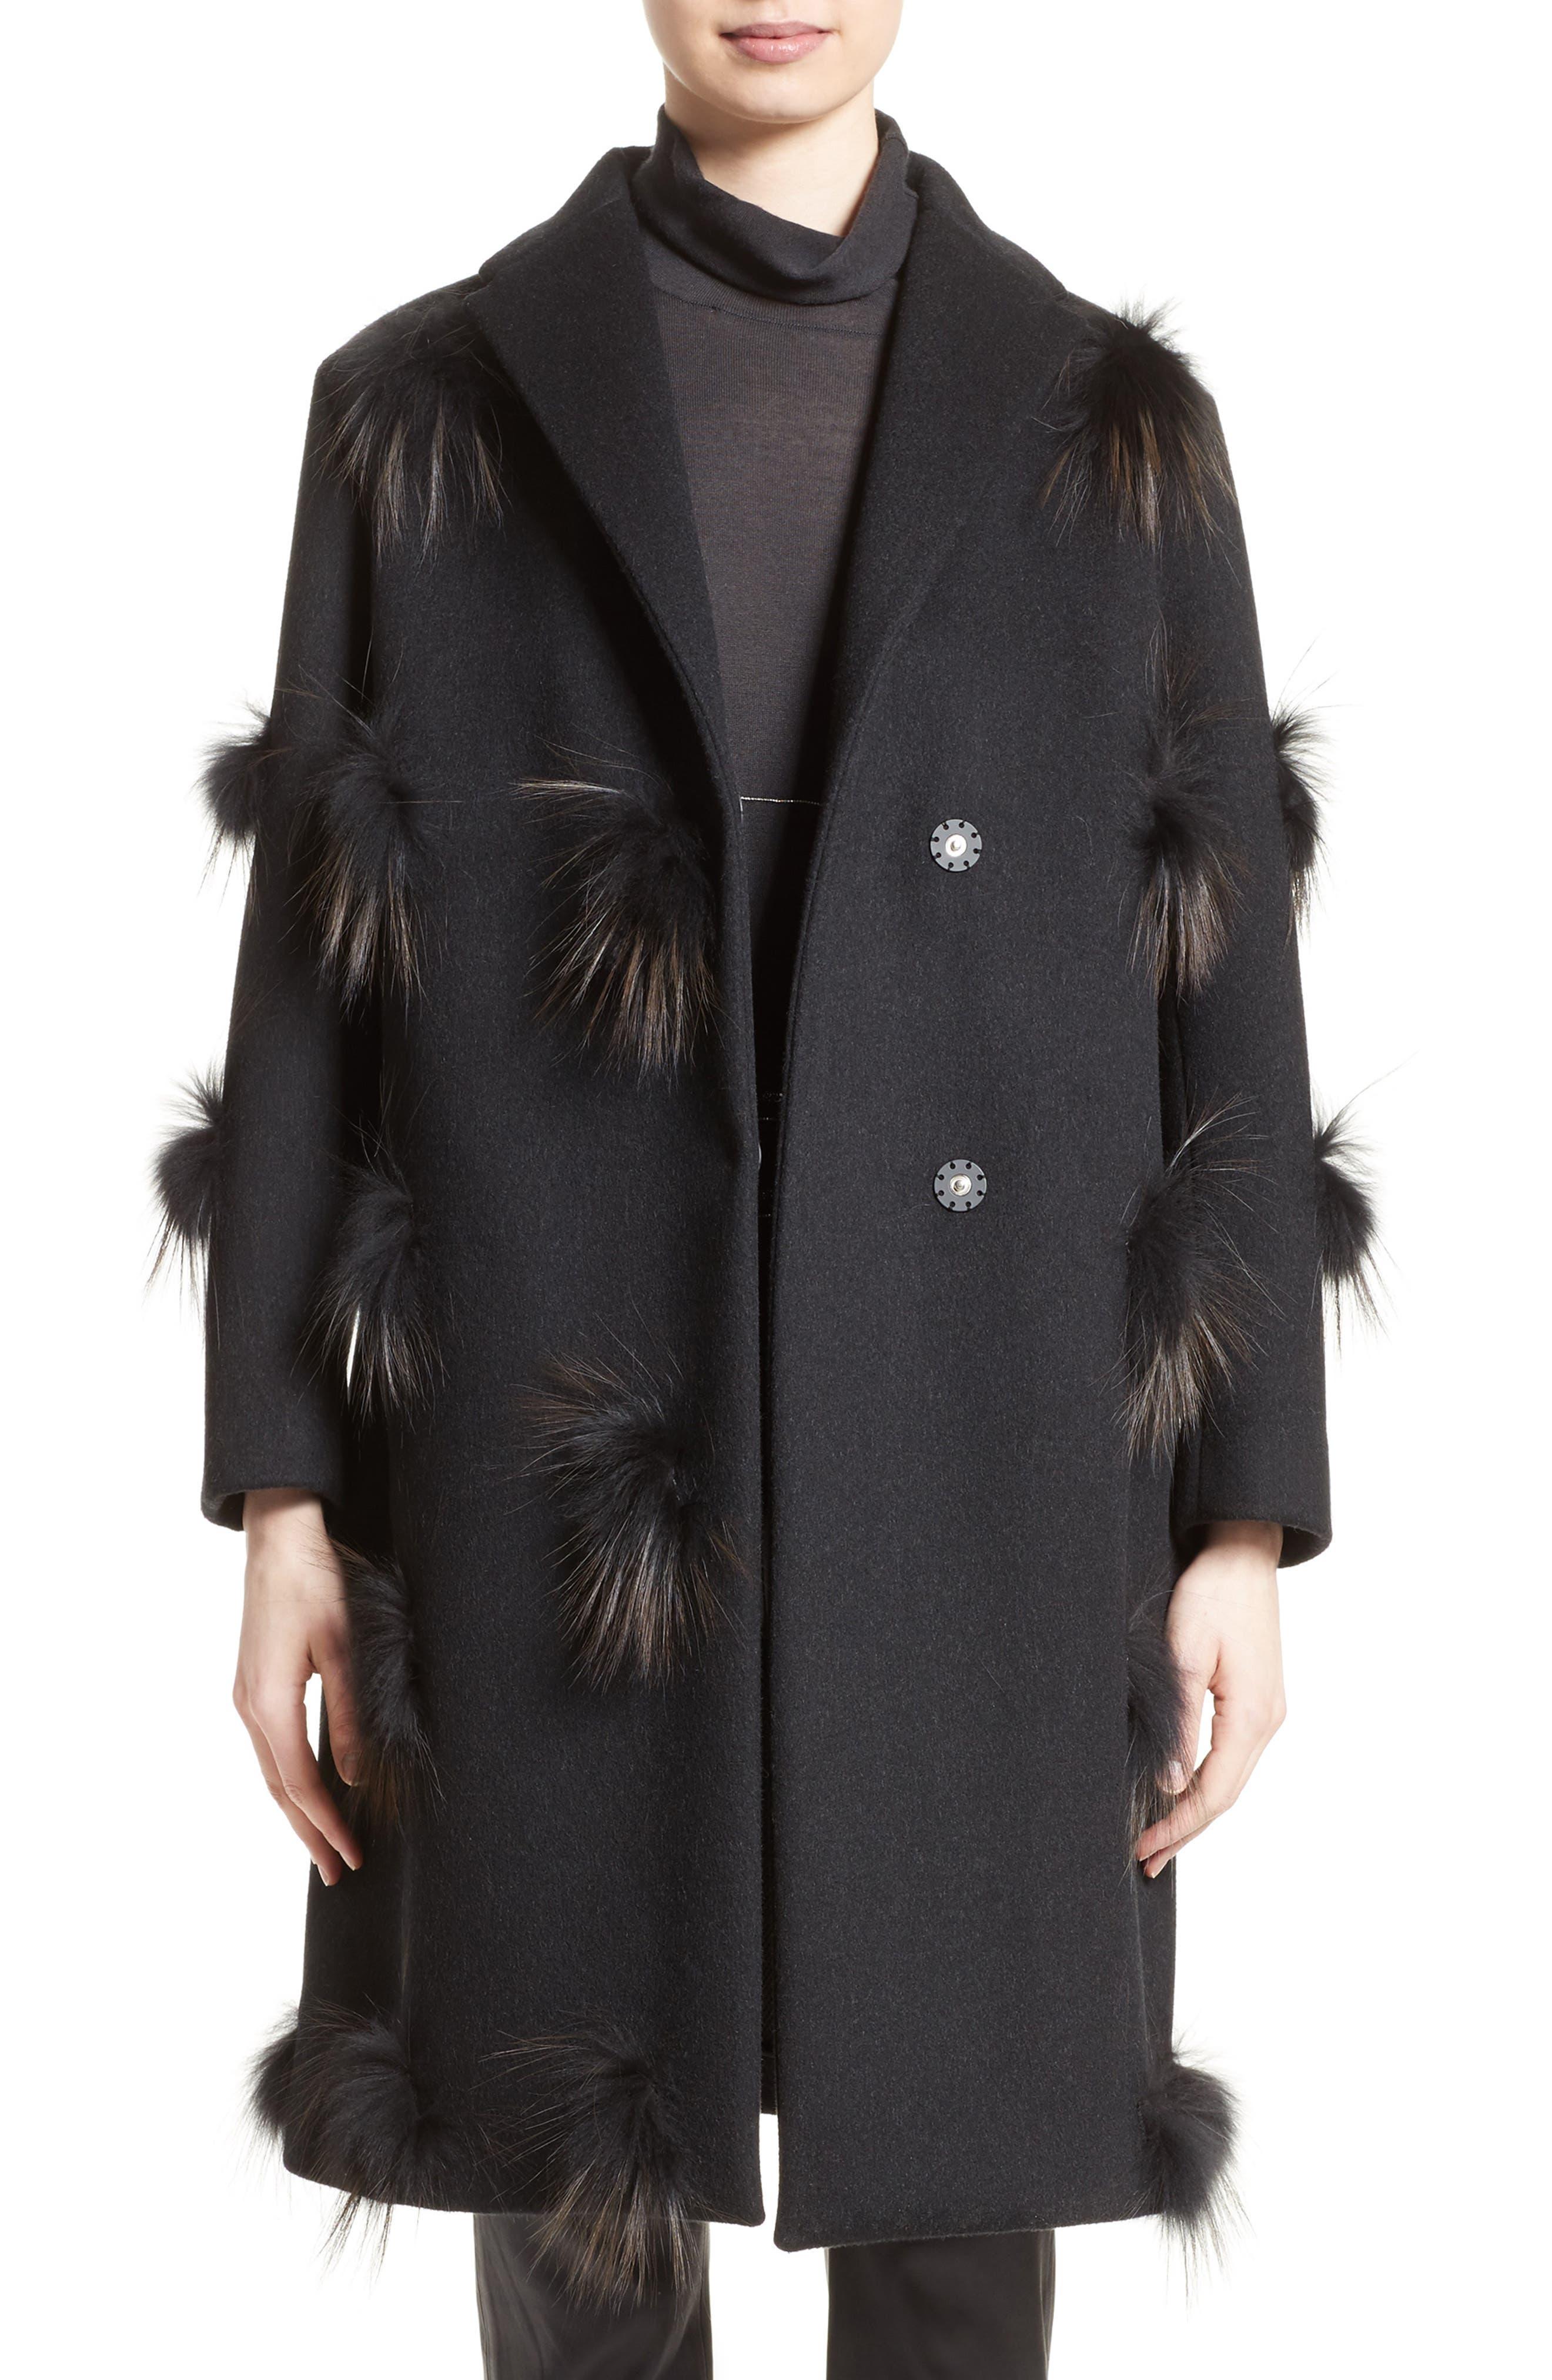 Alternate Image 1 Selected - Fabiana Filippi Genuine Fox Fur Trim Wool Blend Coat